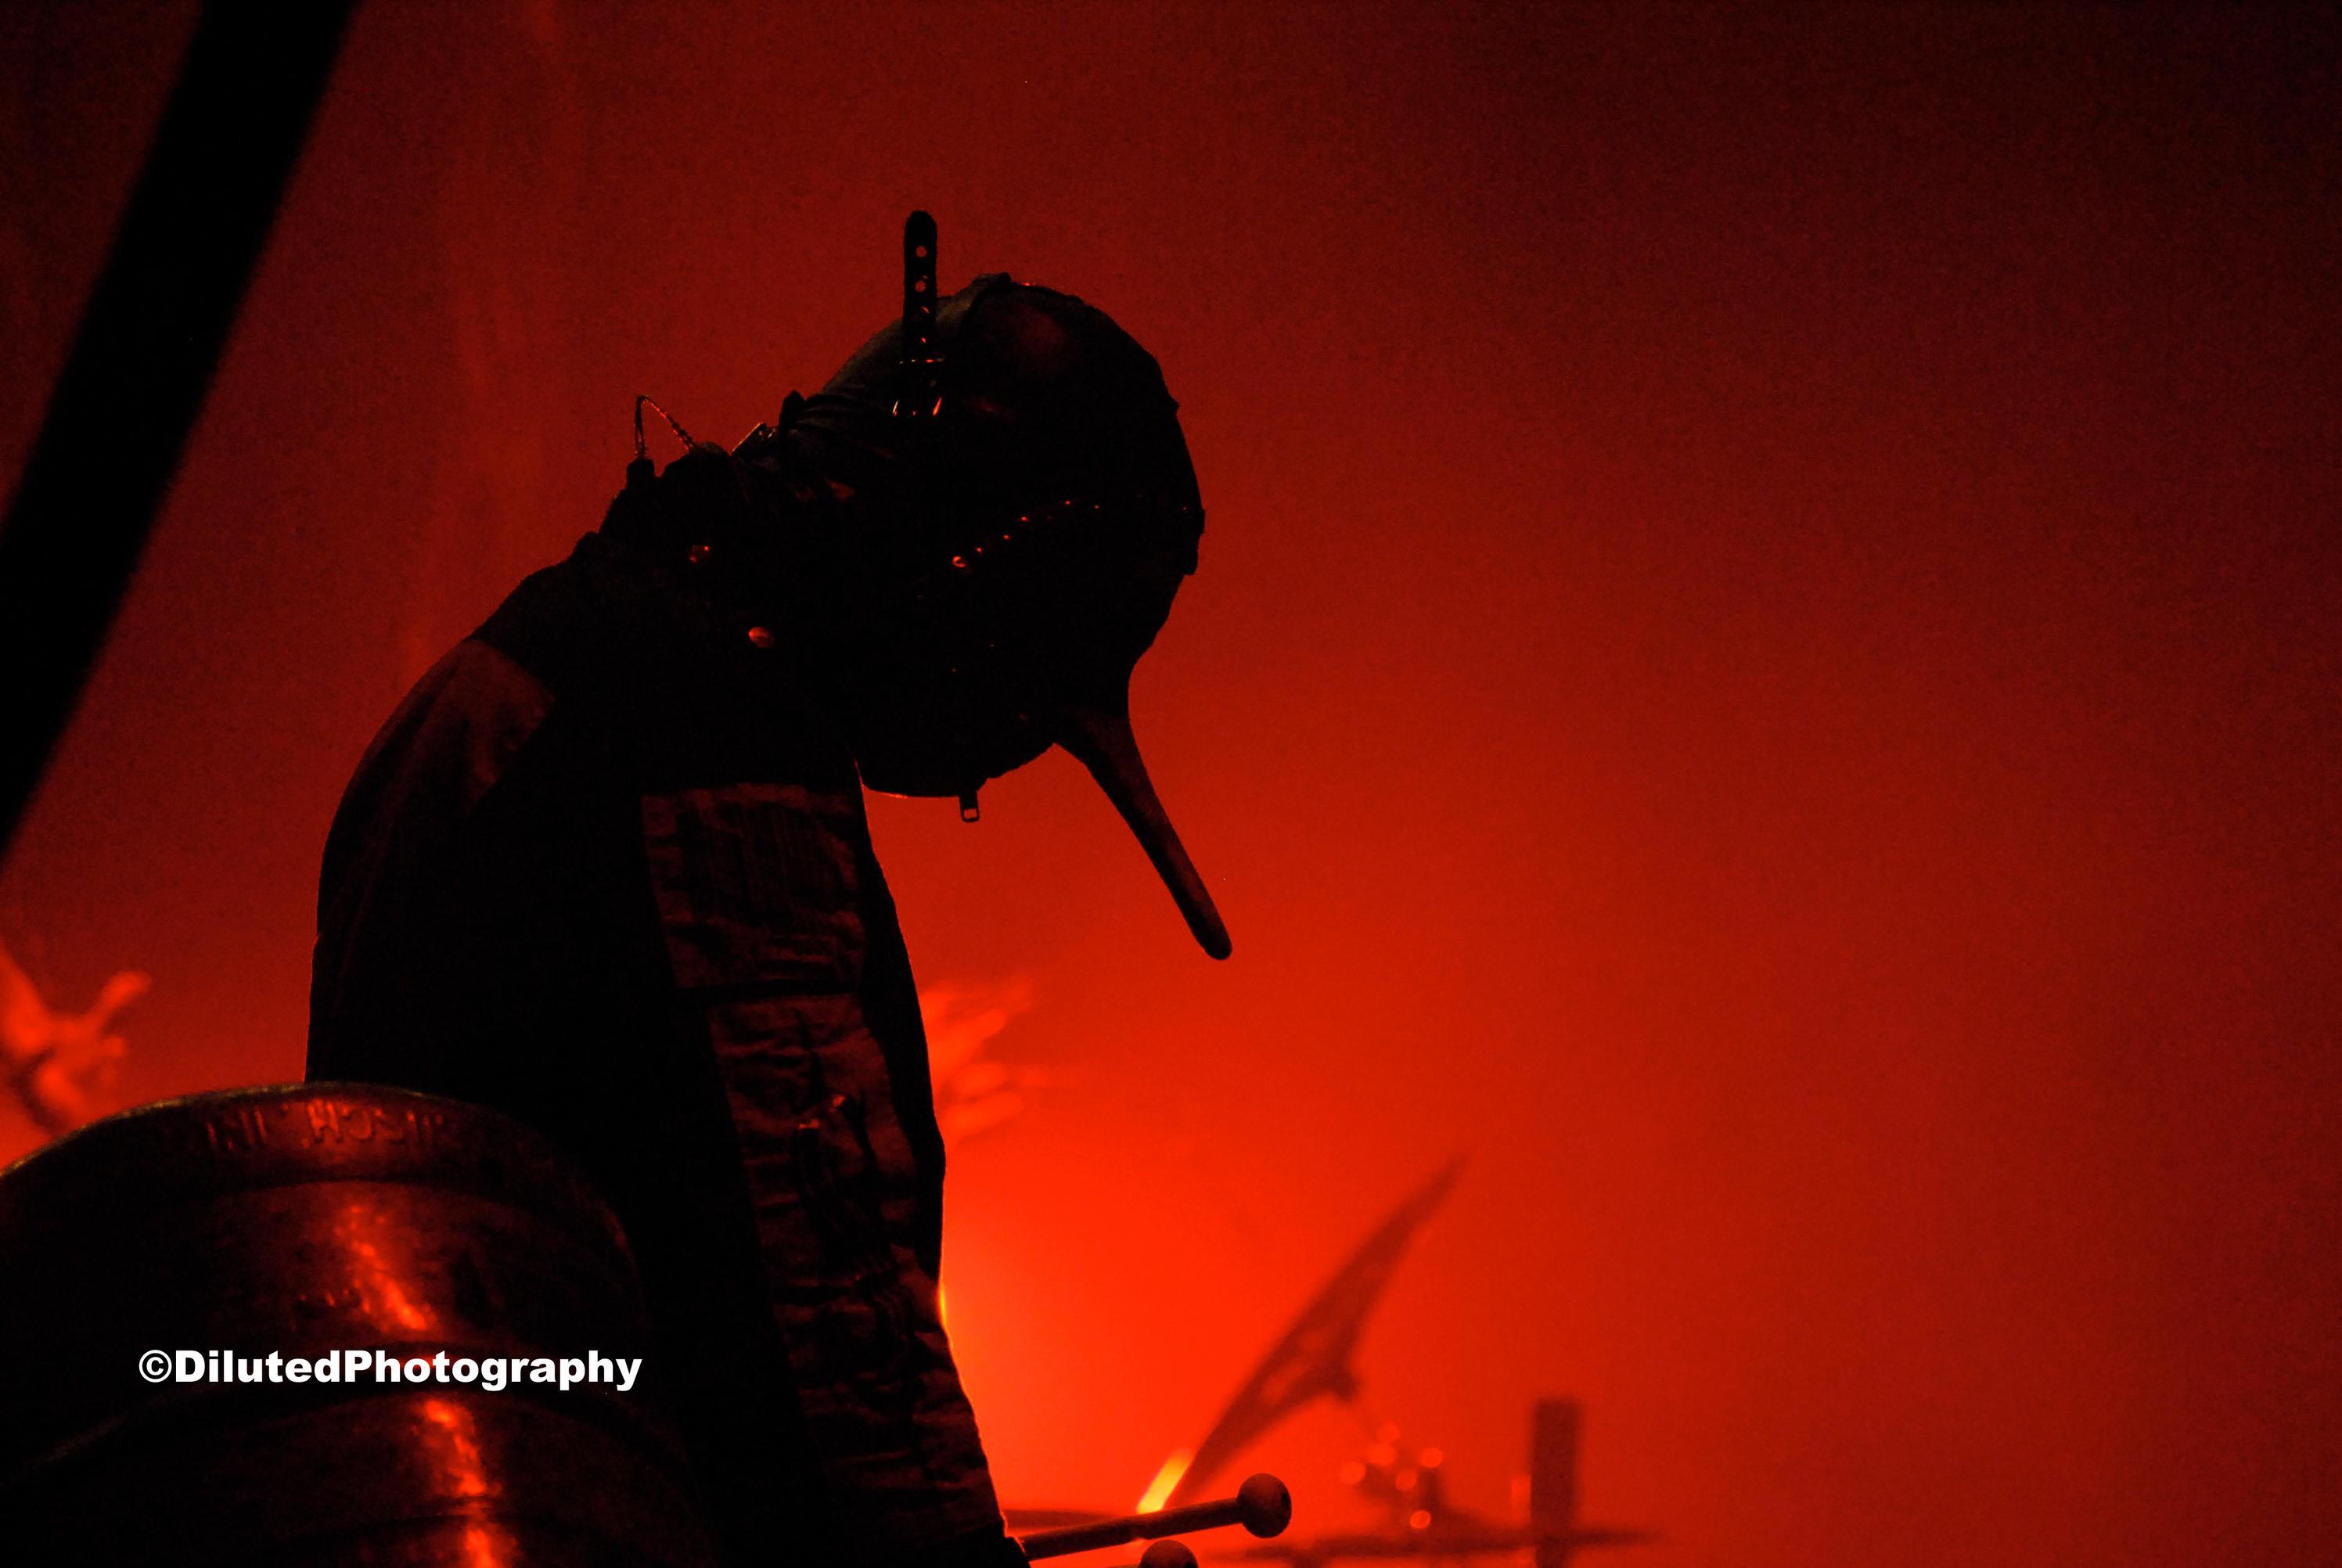 Chris Fehn Slipknot By DilutedPhotography